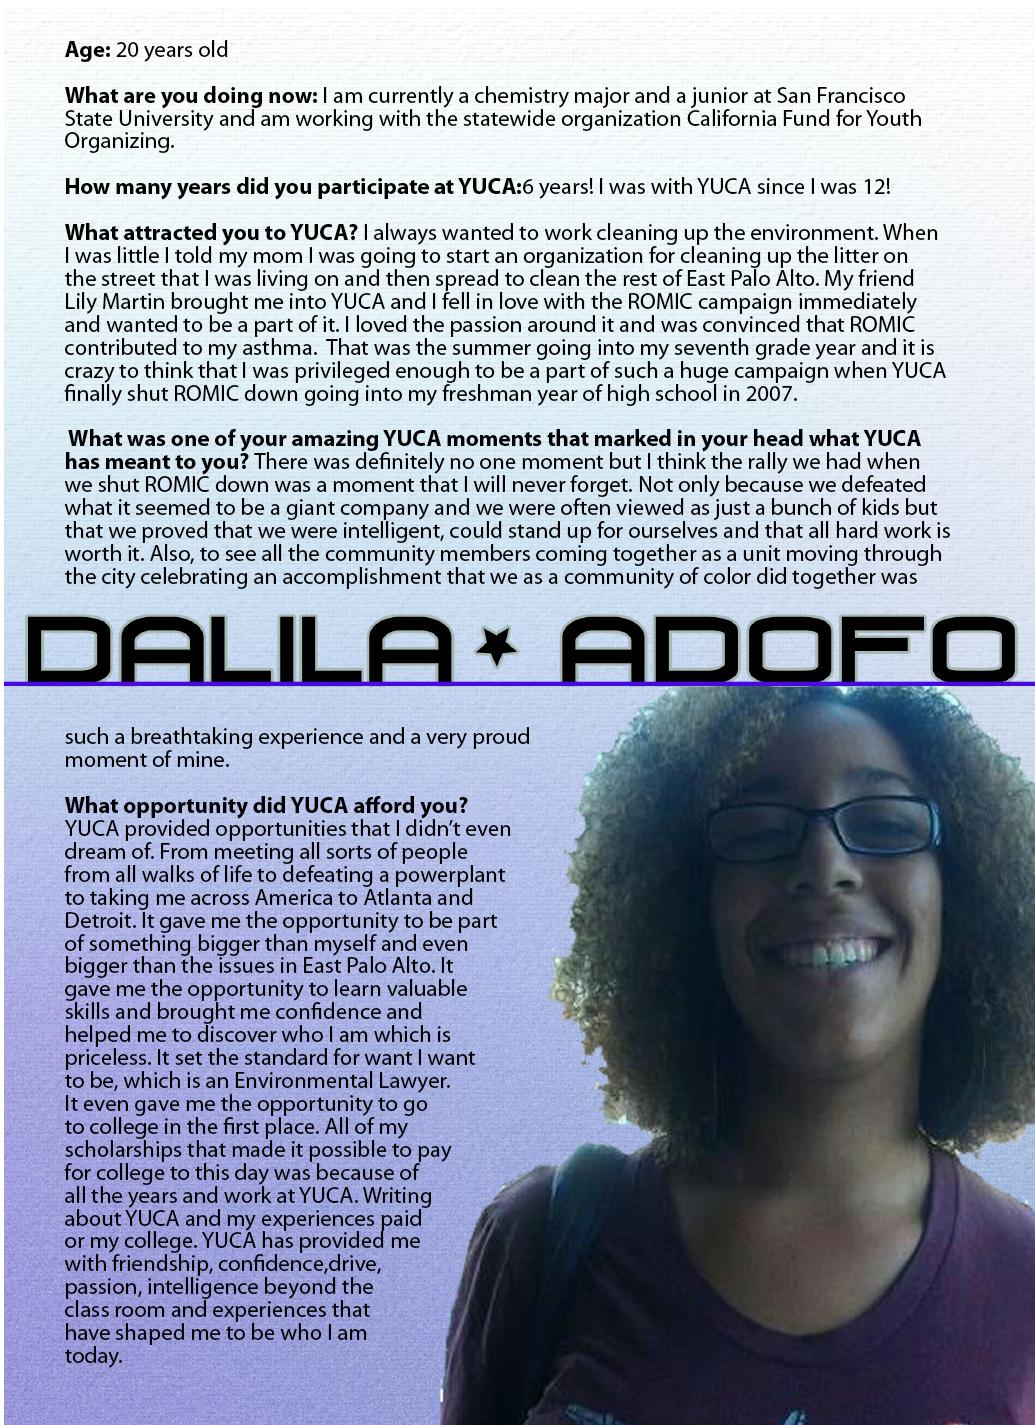 Dalila.jpg